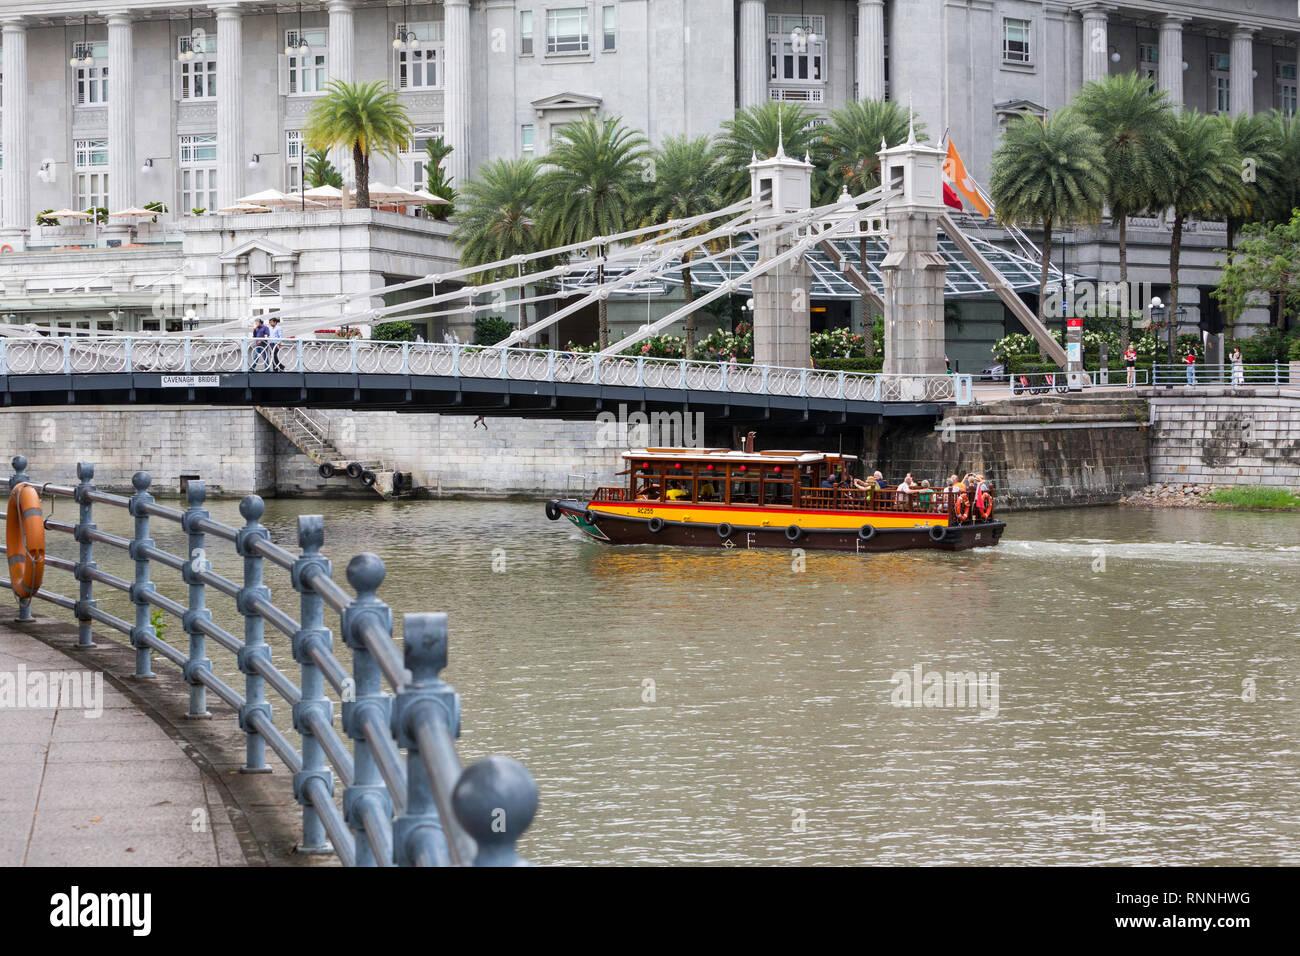 Singapore River Water Taxi Going under Cavenagh Bridge, Singapore. - Stock Image